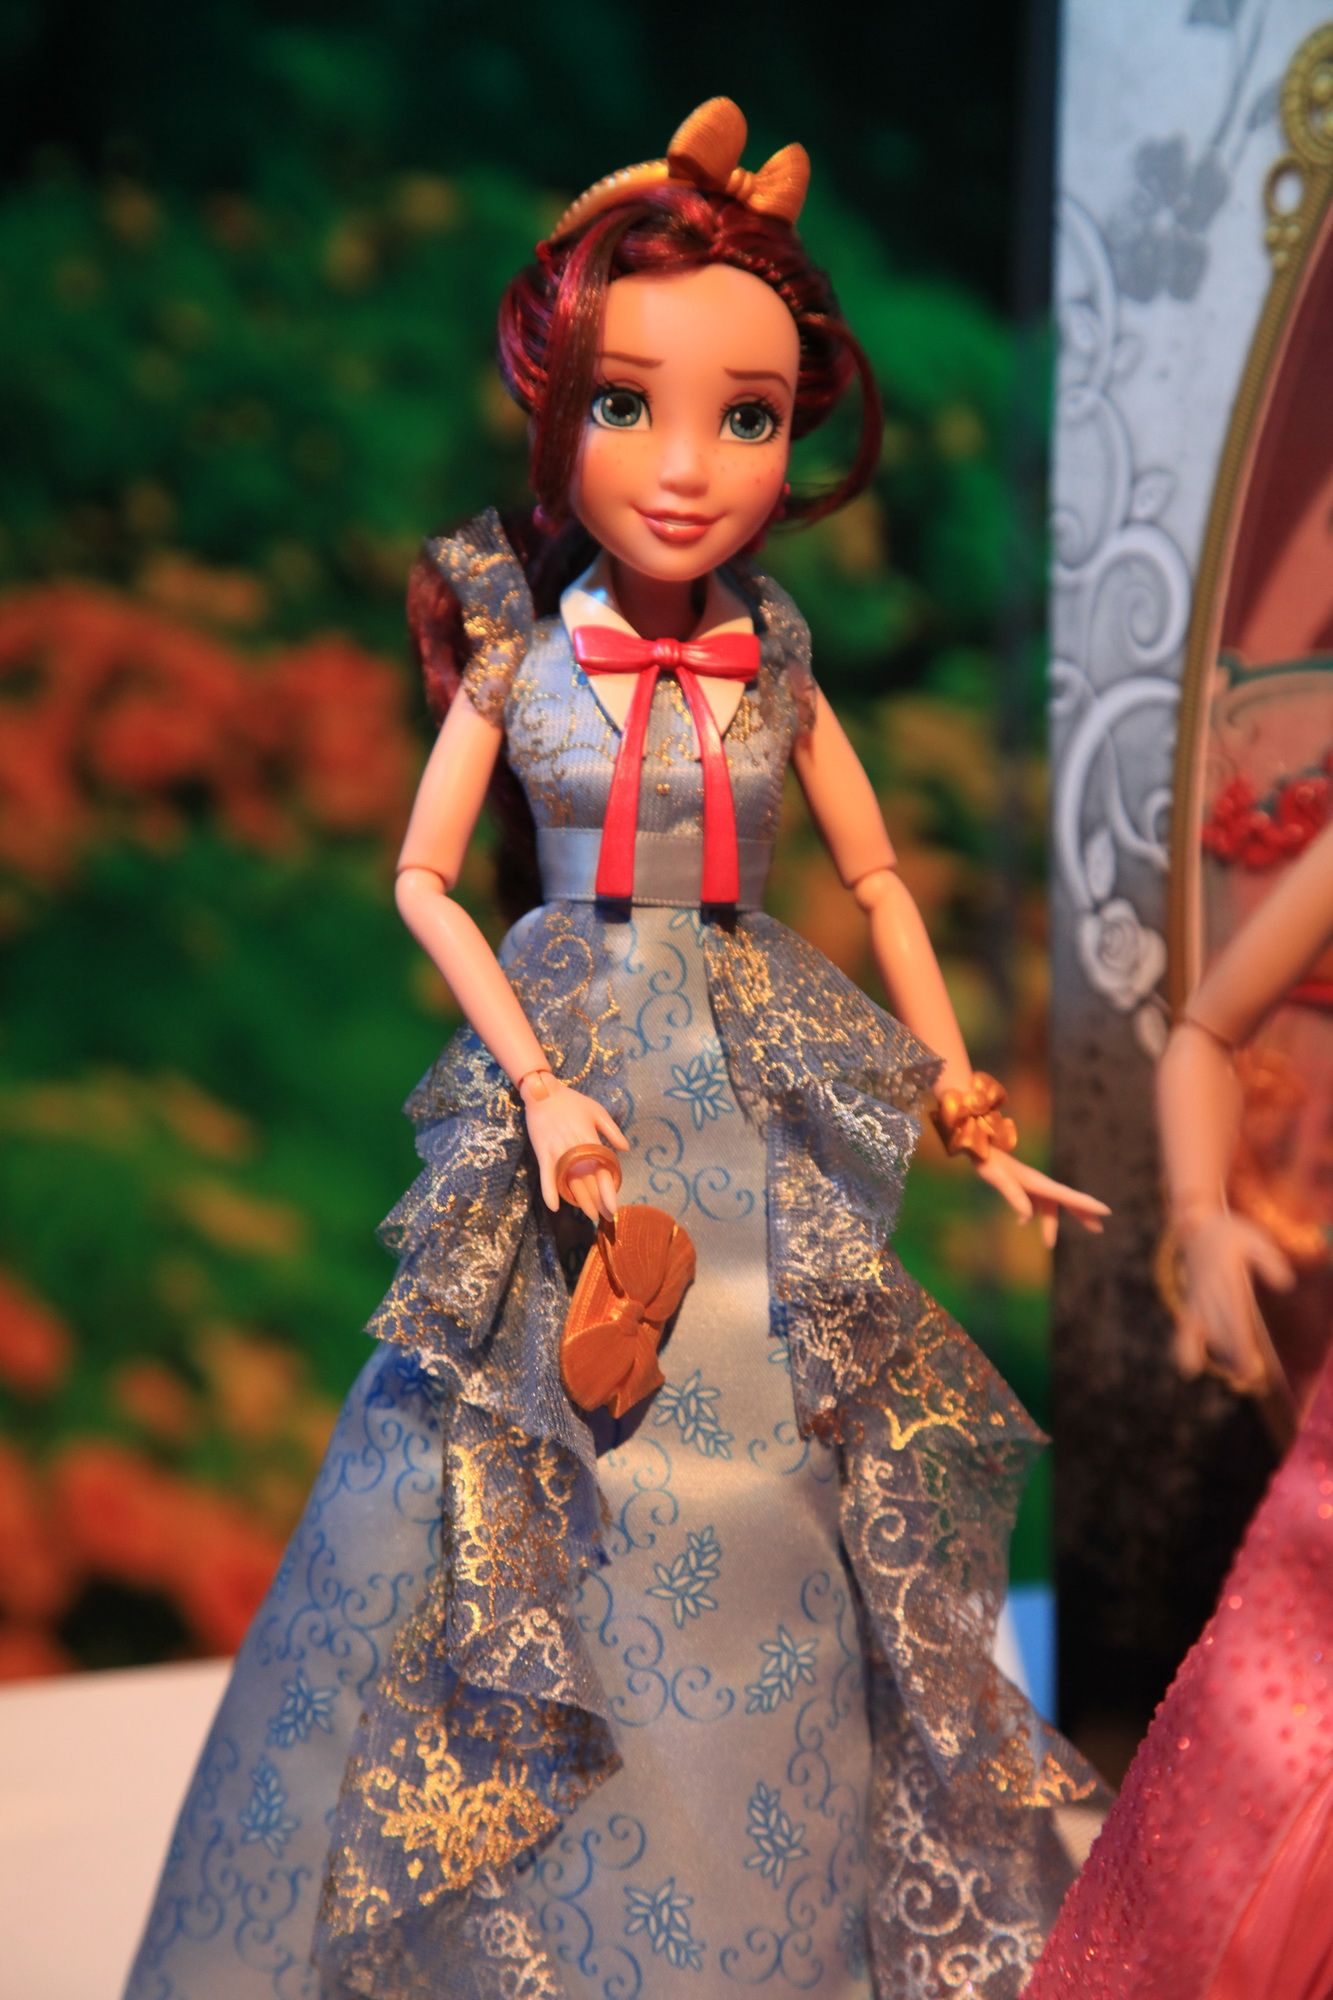 Disney Descendants Jane Daughter Of The Fairy Godmother In Her